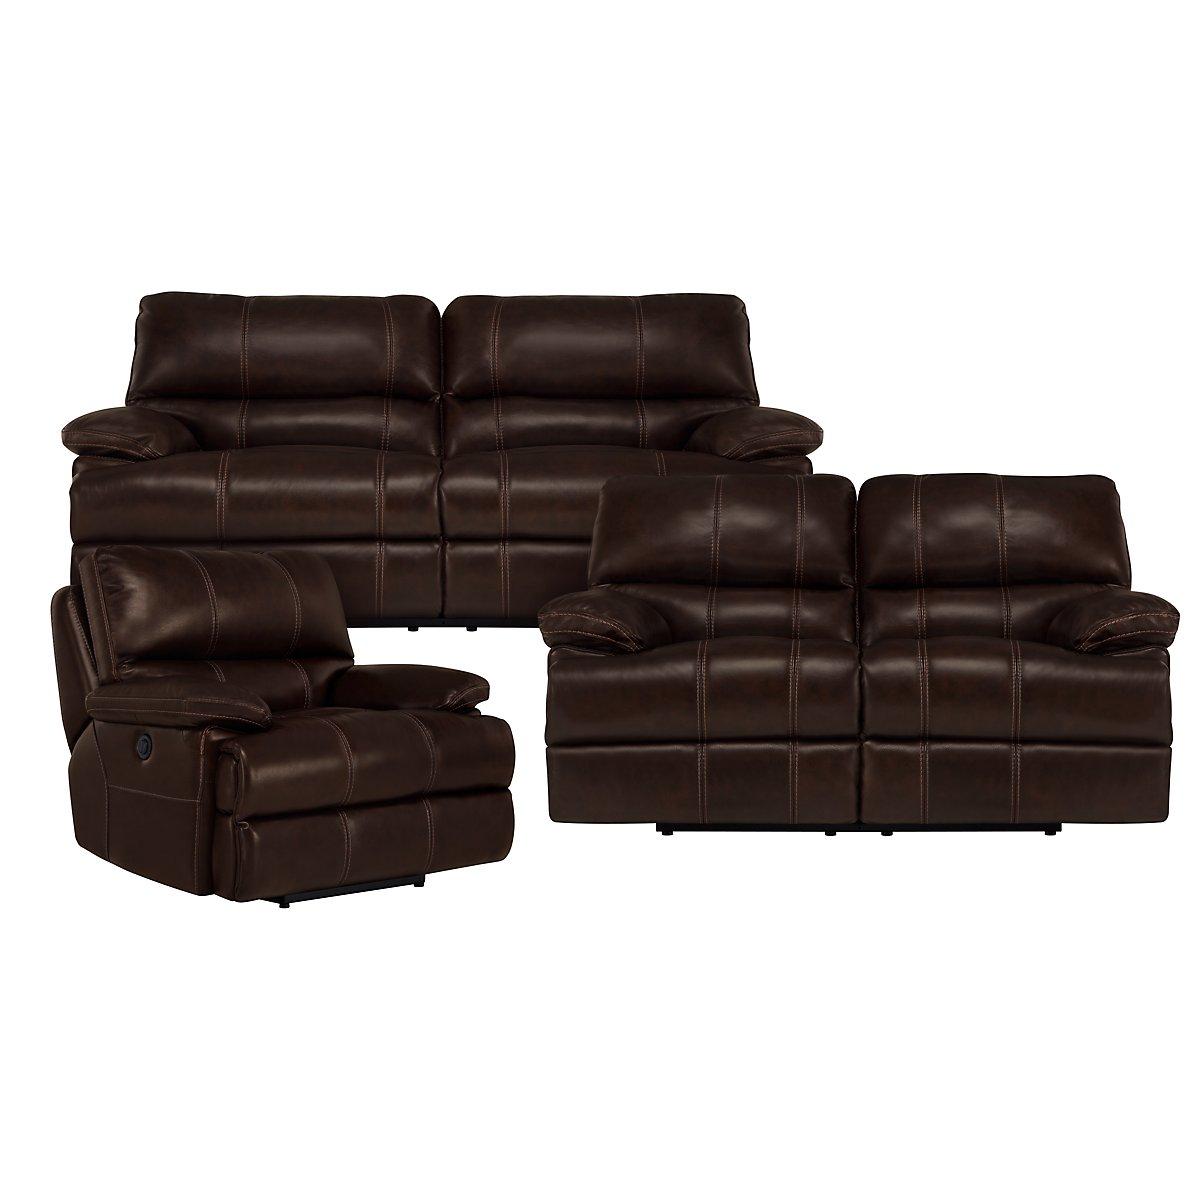 Alton2 Dark Brown Leather & Vinyl Power Reclining Living Room